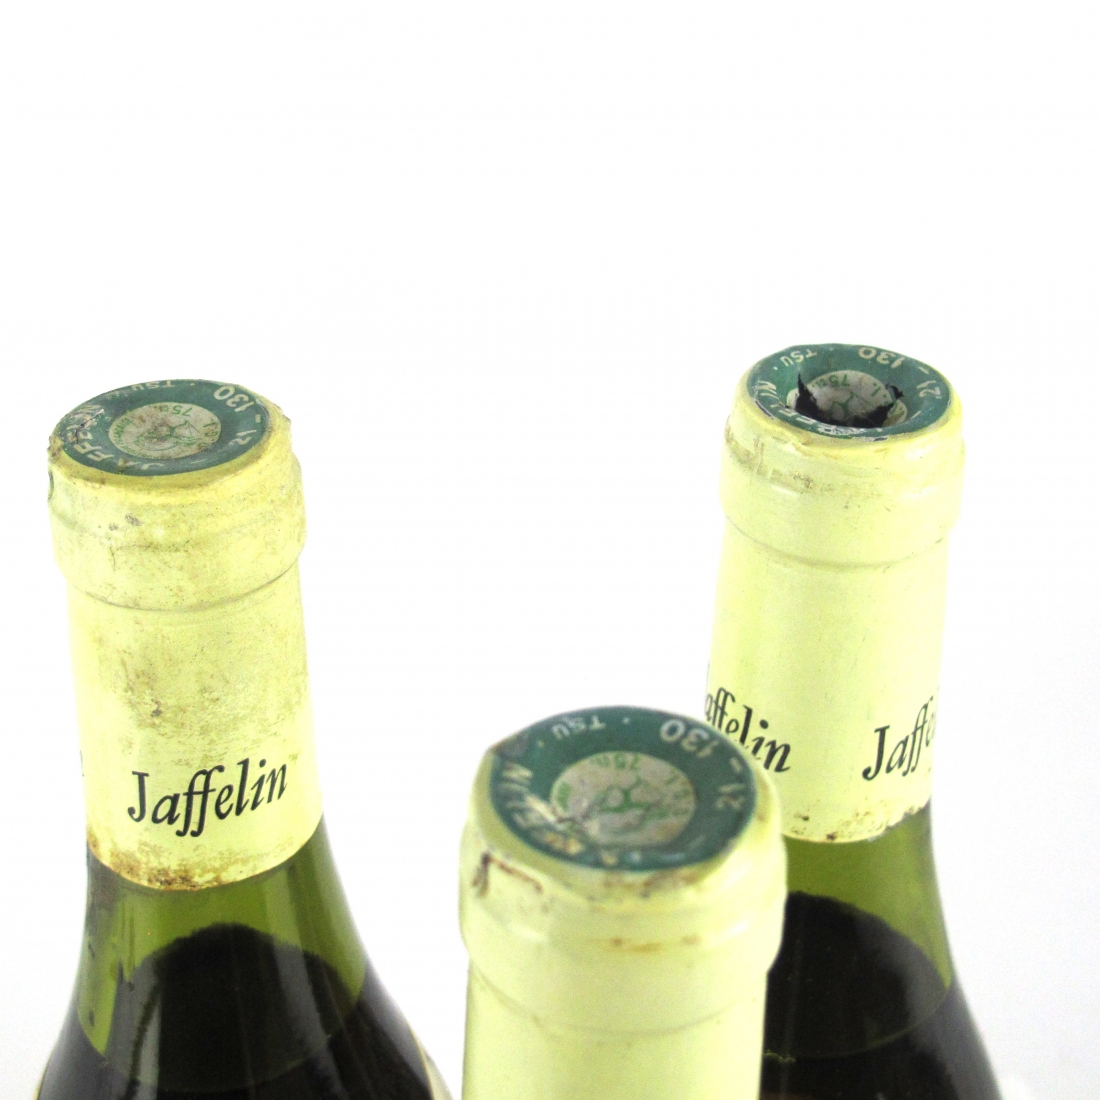 Jaffelin 1985 Chablis 3x75cl